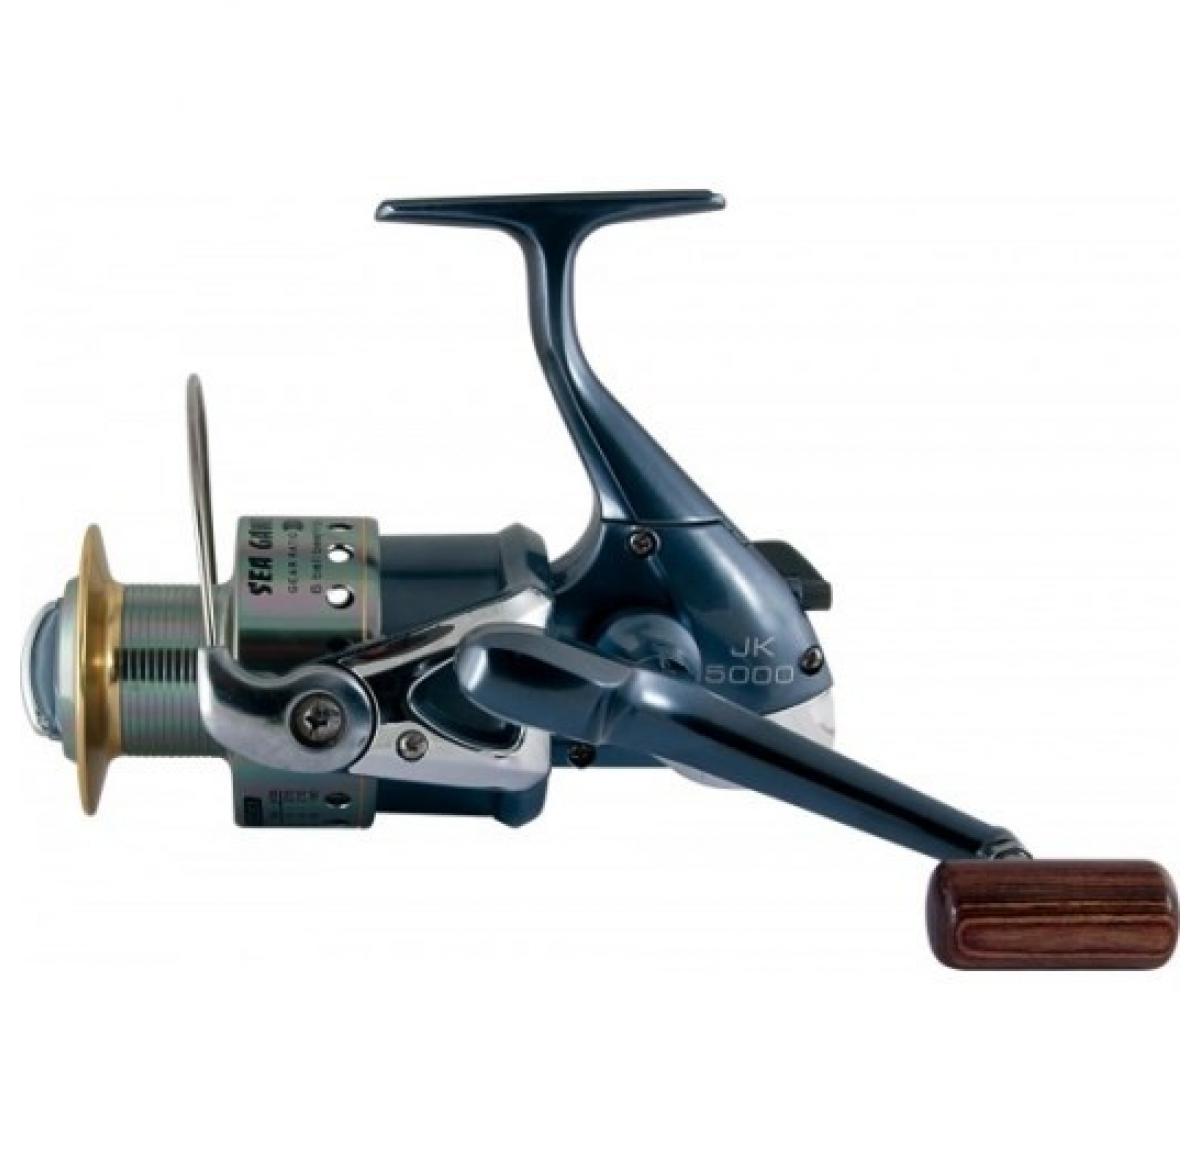 York Sea Game JK5000